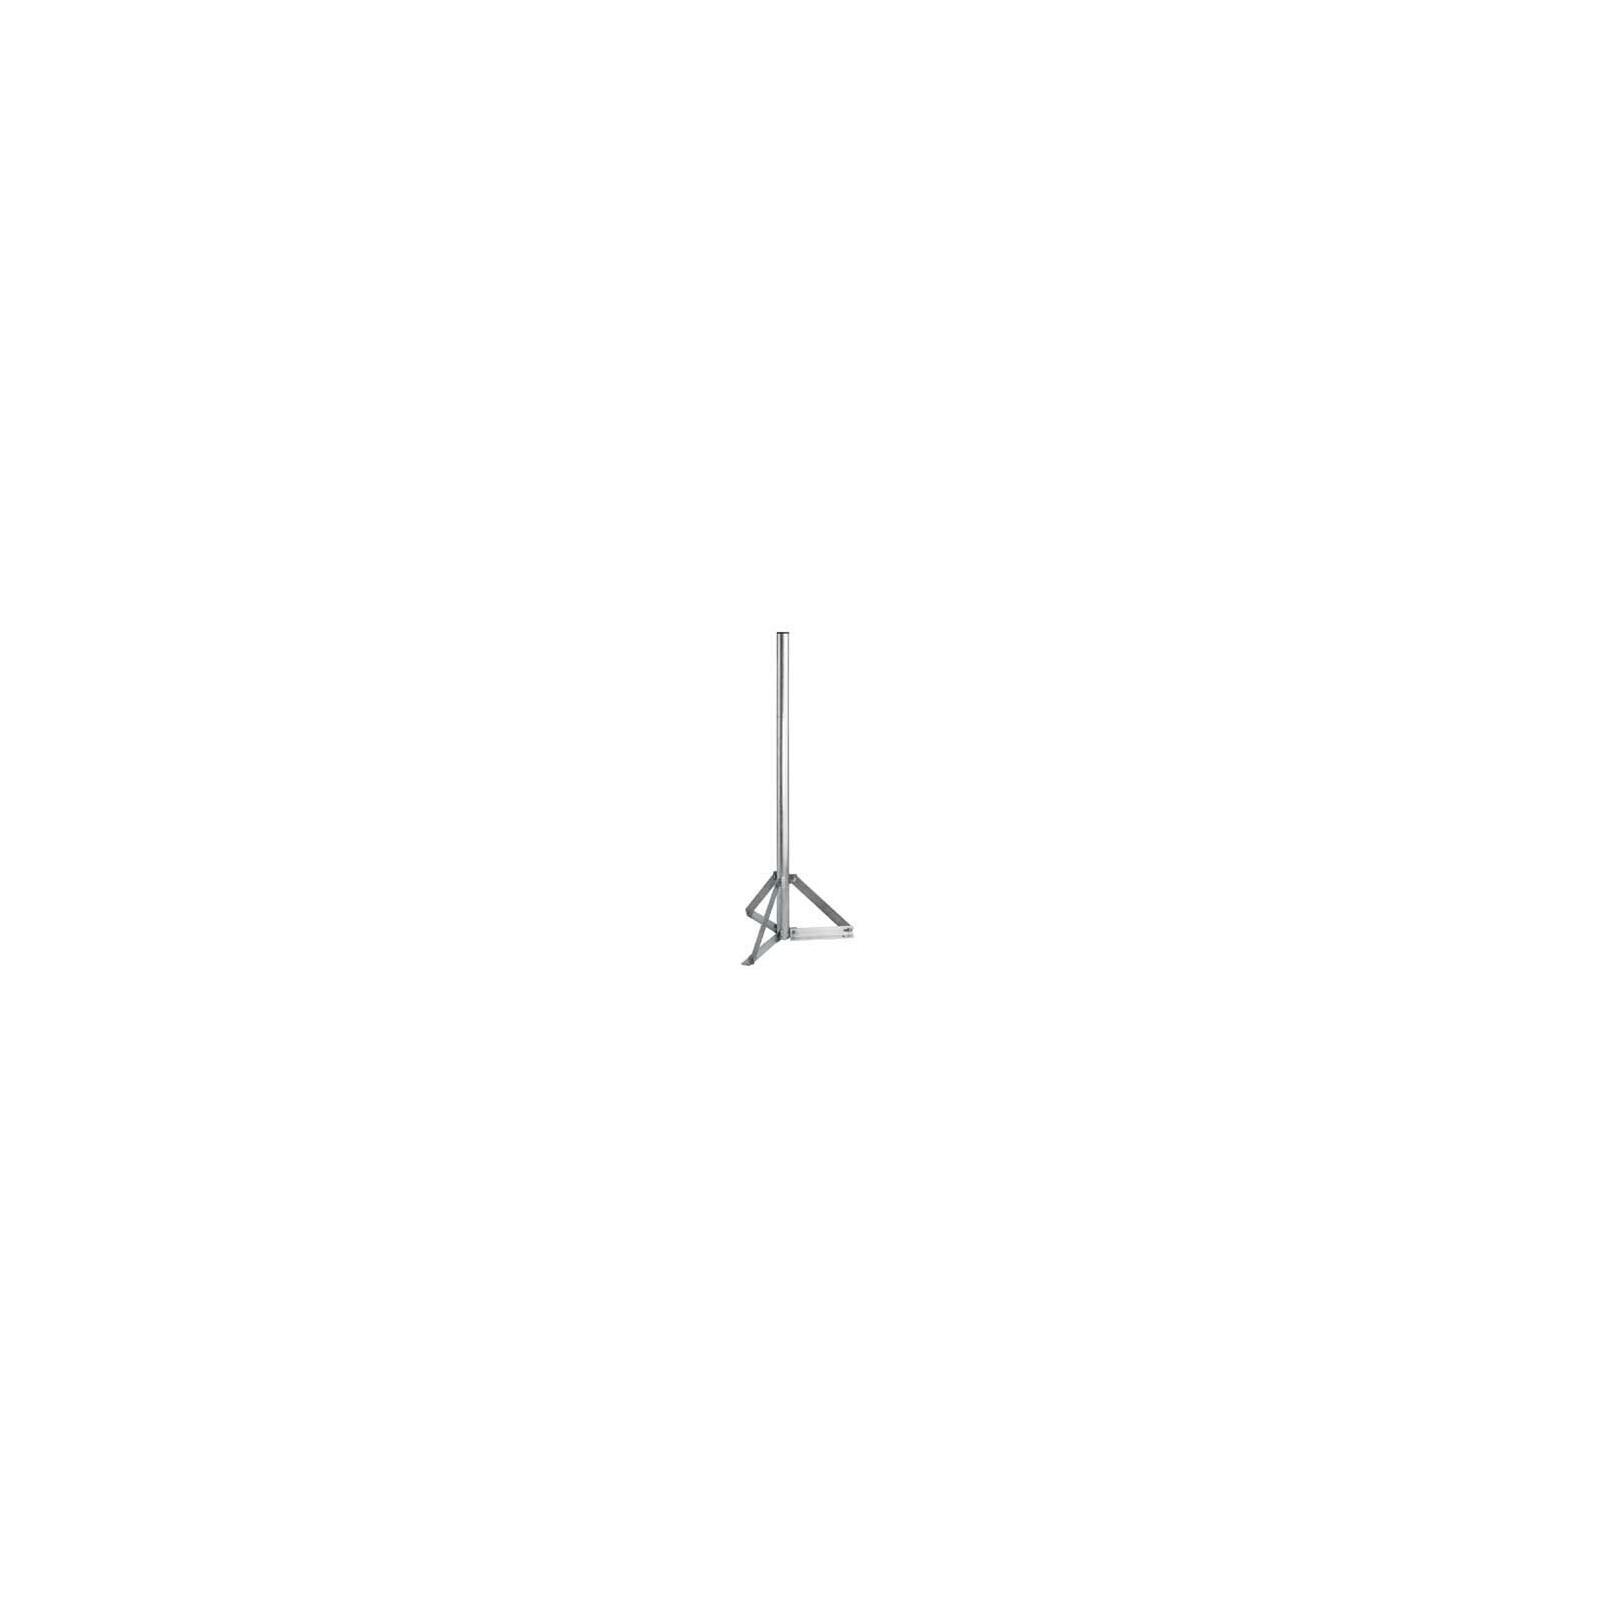 "Hama 47467 Standfuß ""Tripod"" für Satellitenspiegel, Aluminiu"